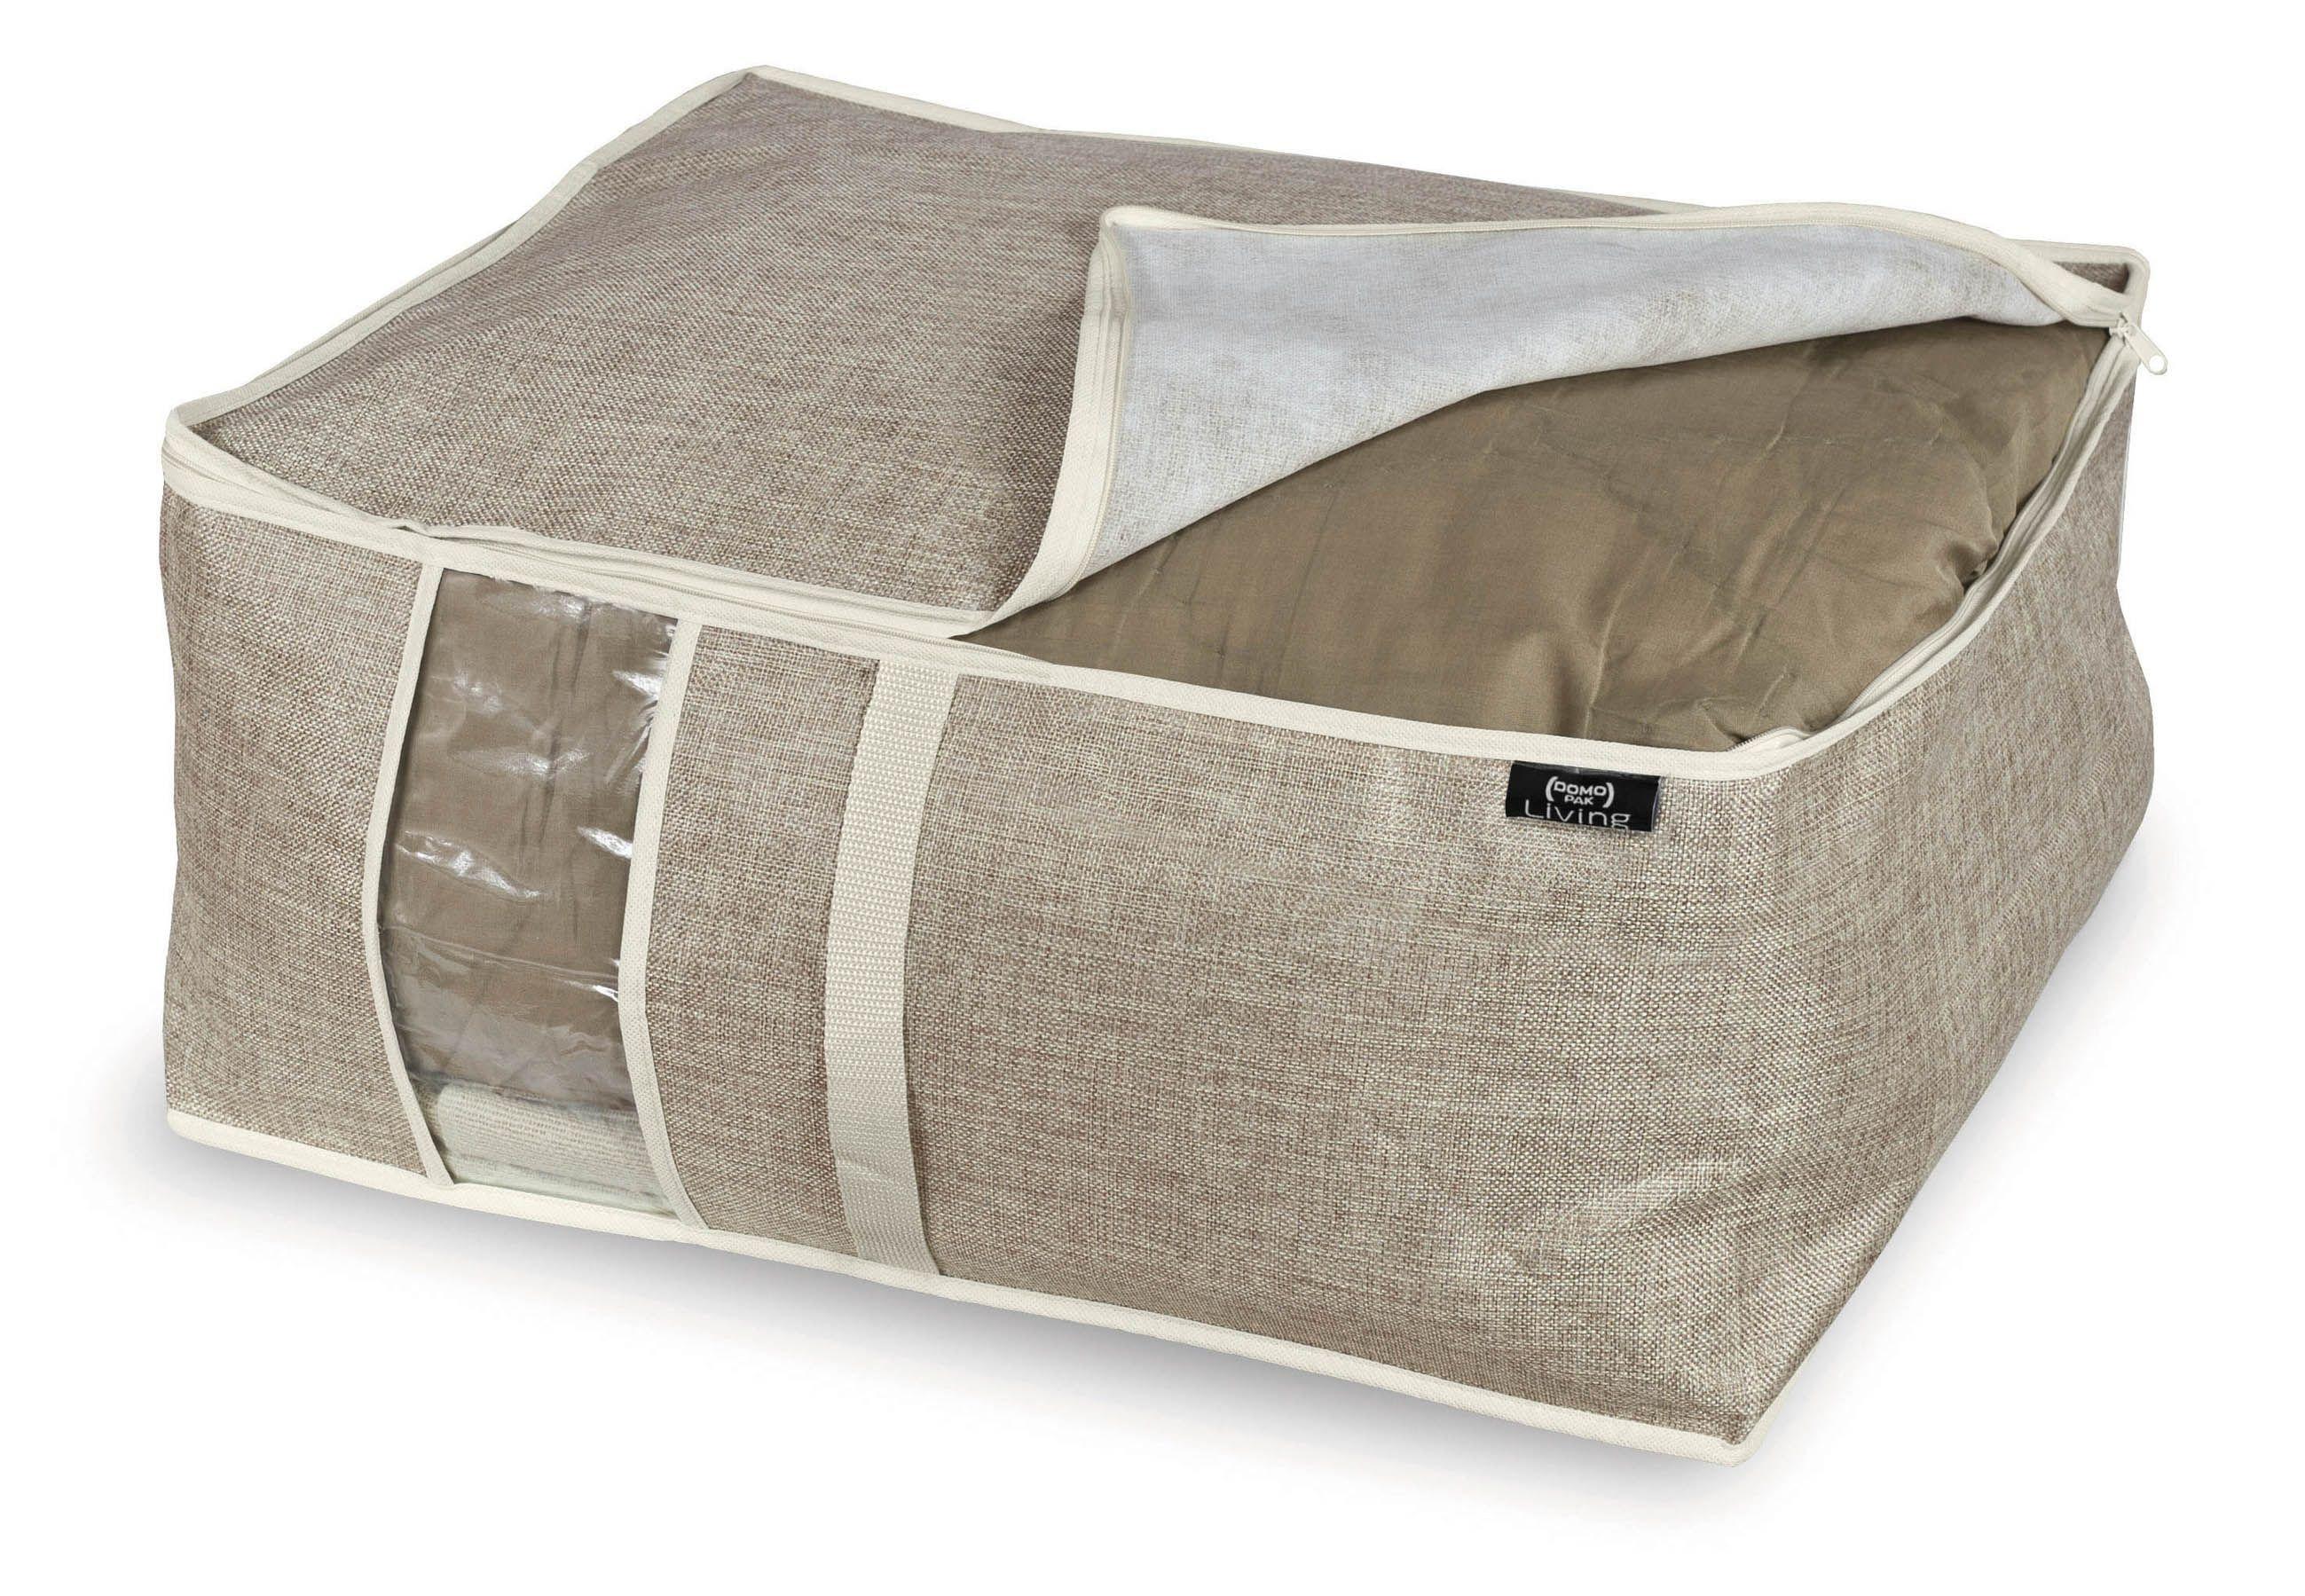 Organizator textil pliabil cu fermoar, Maison Crem, L55xl45xH25 cm imagine